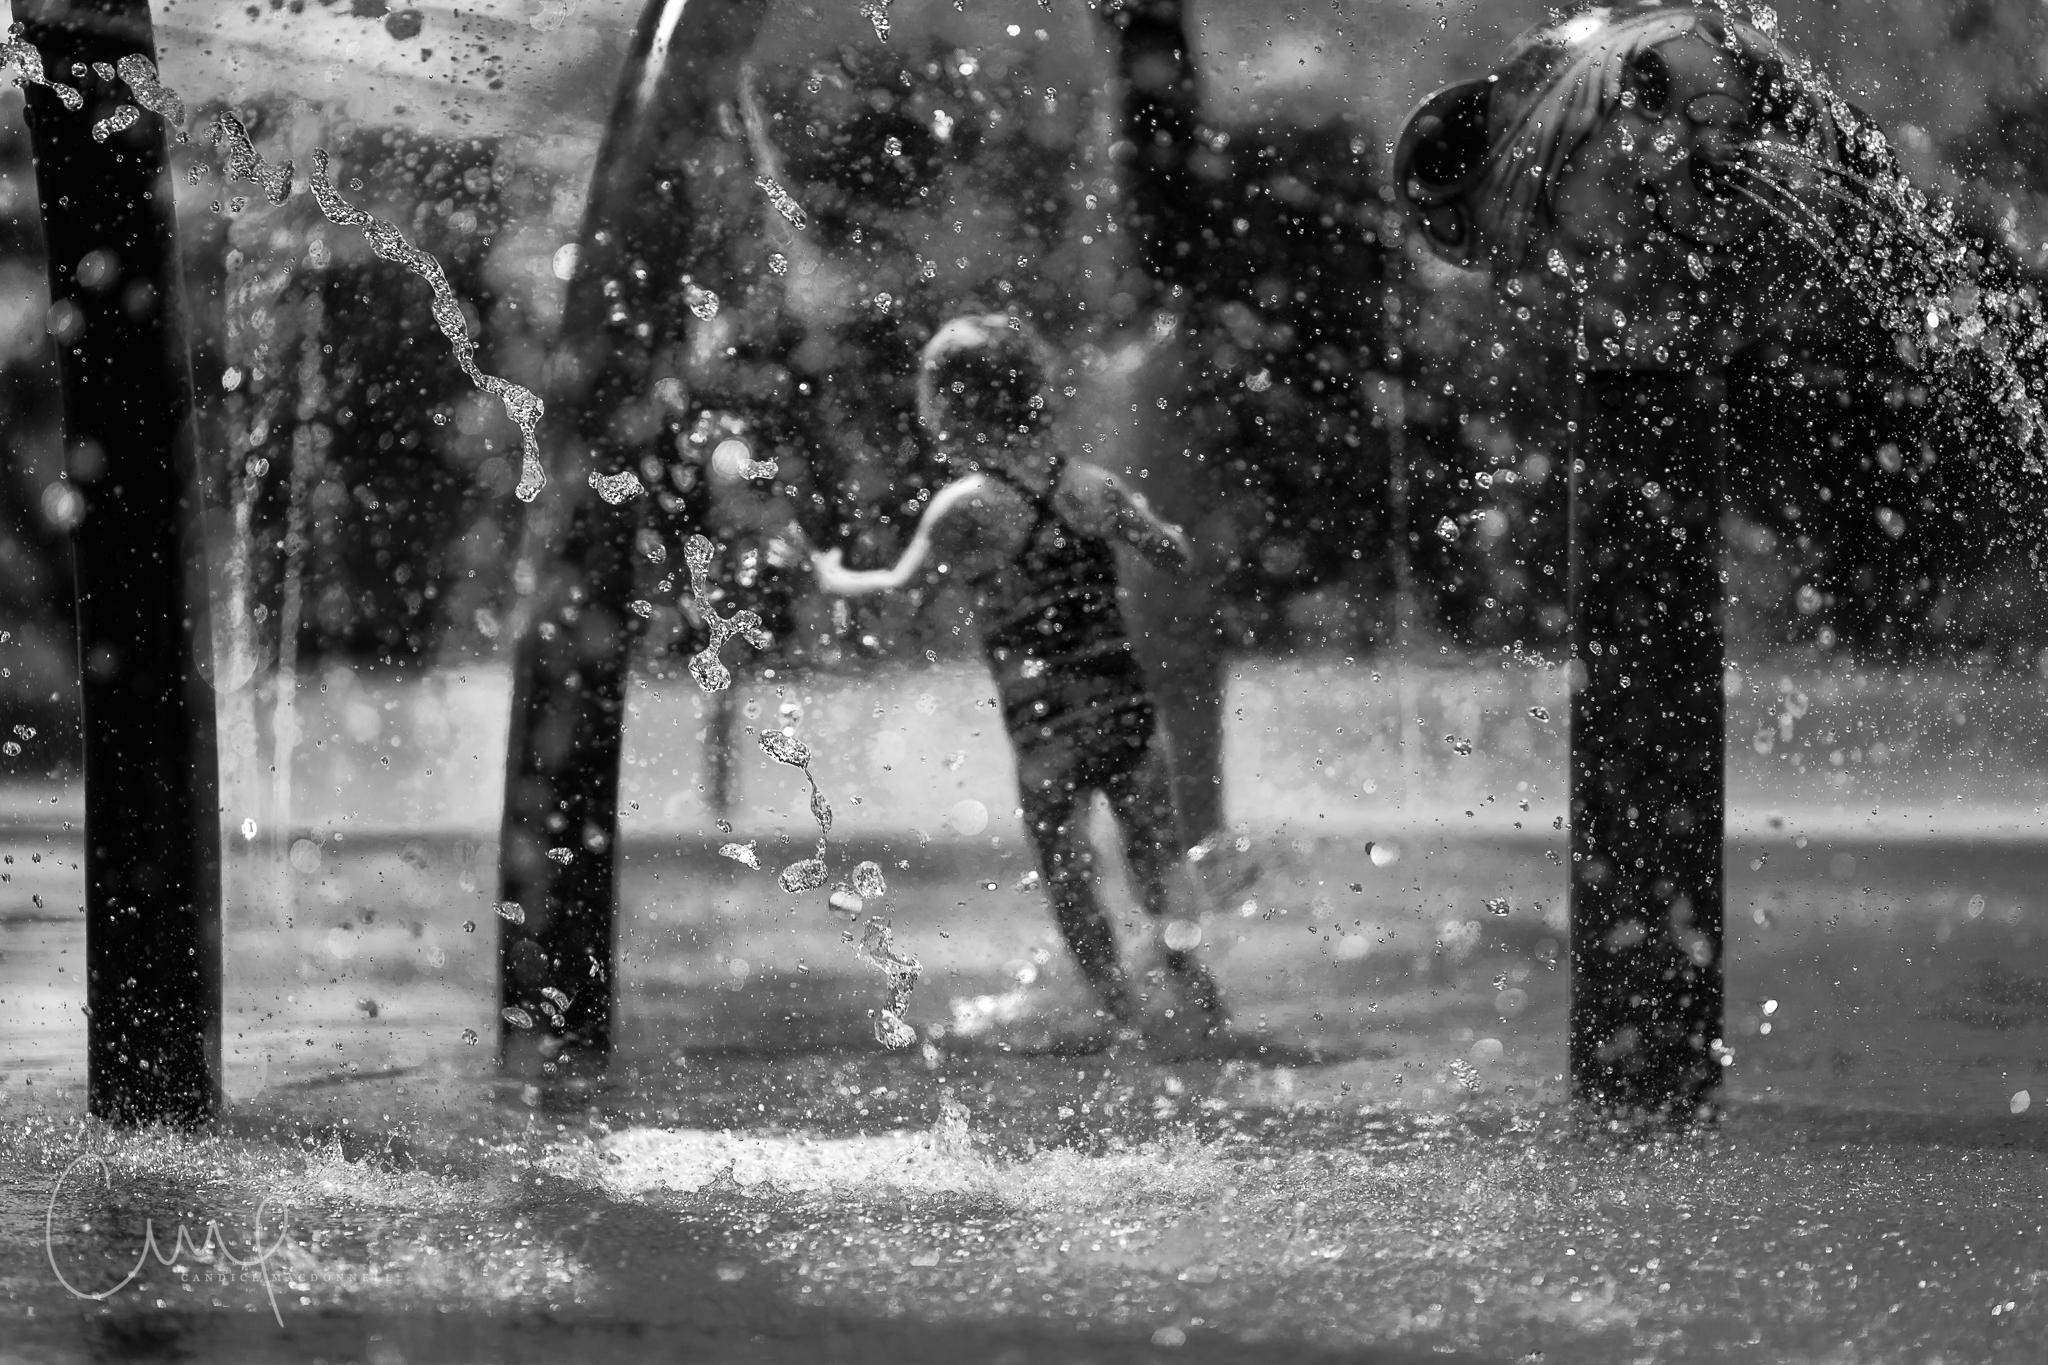 girl running in water at splash park oahu hawaii children documentary photographer